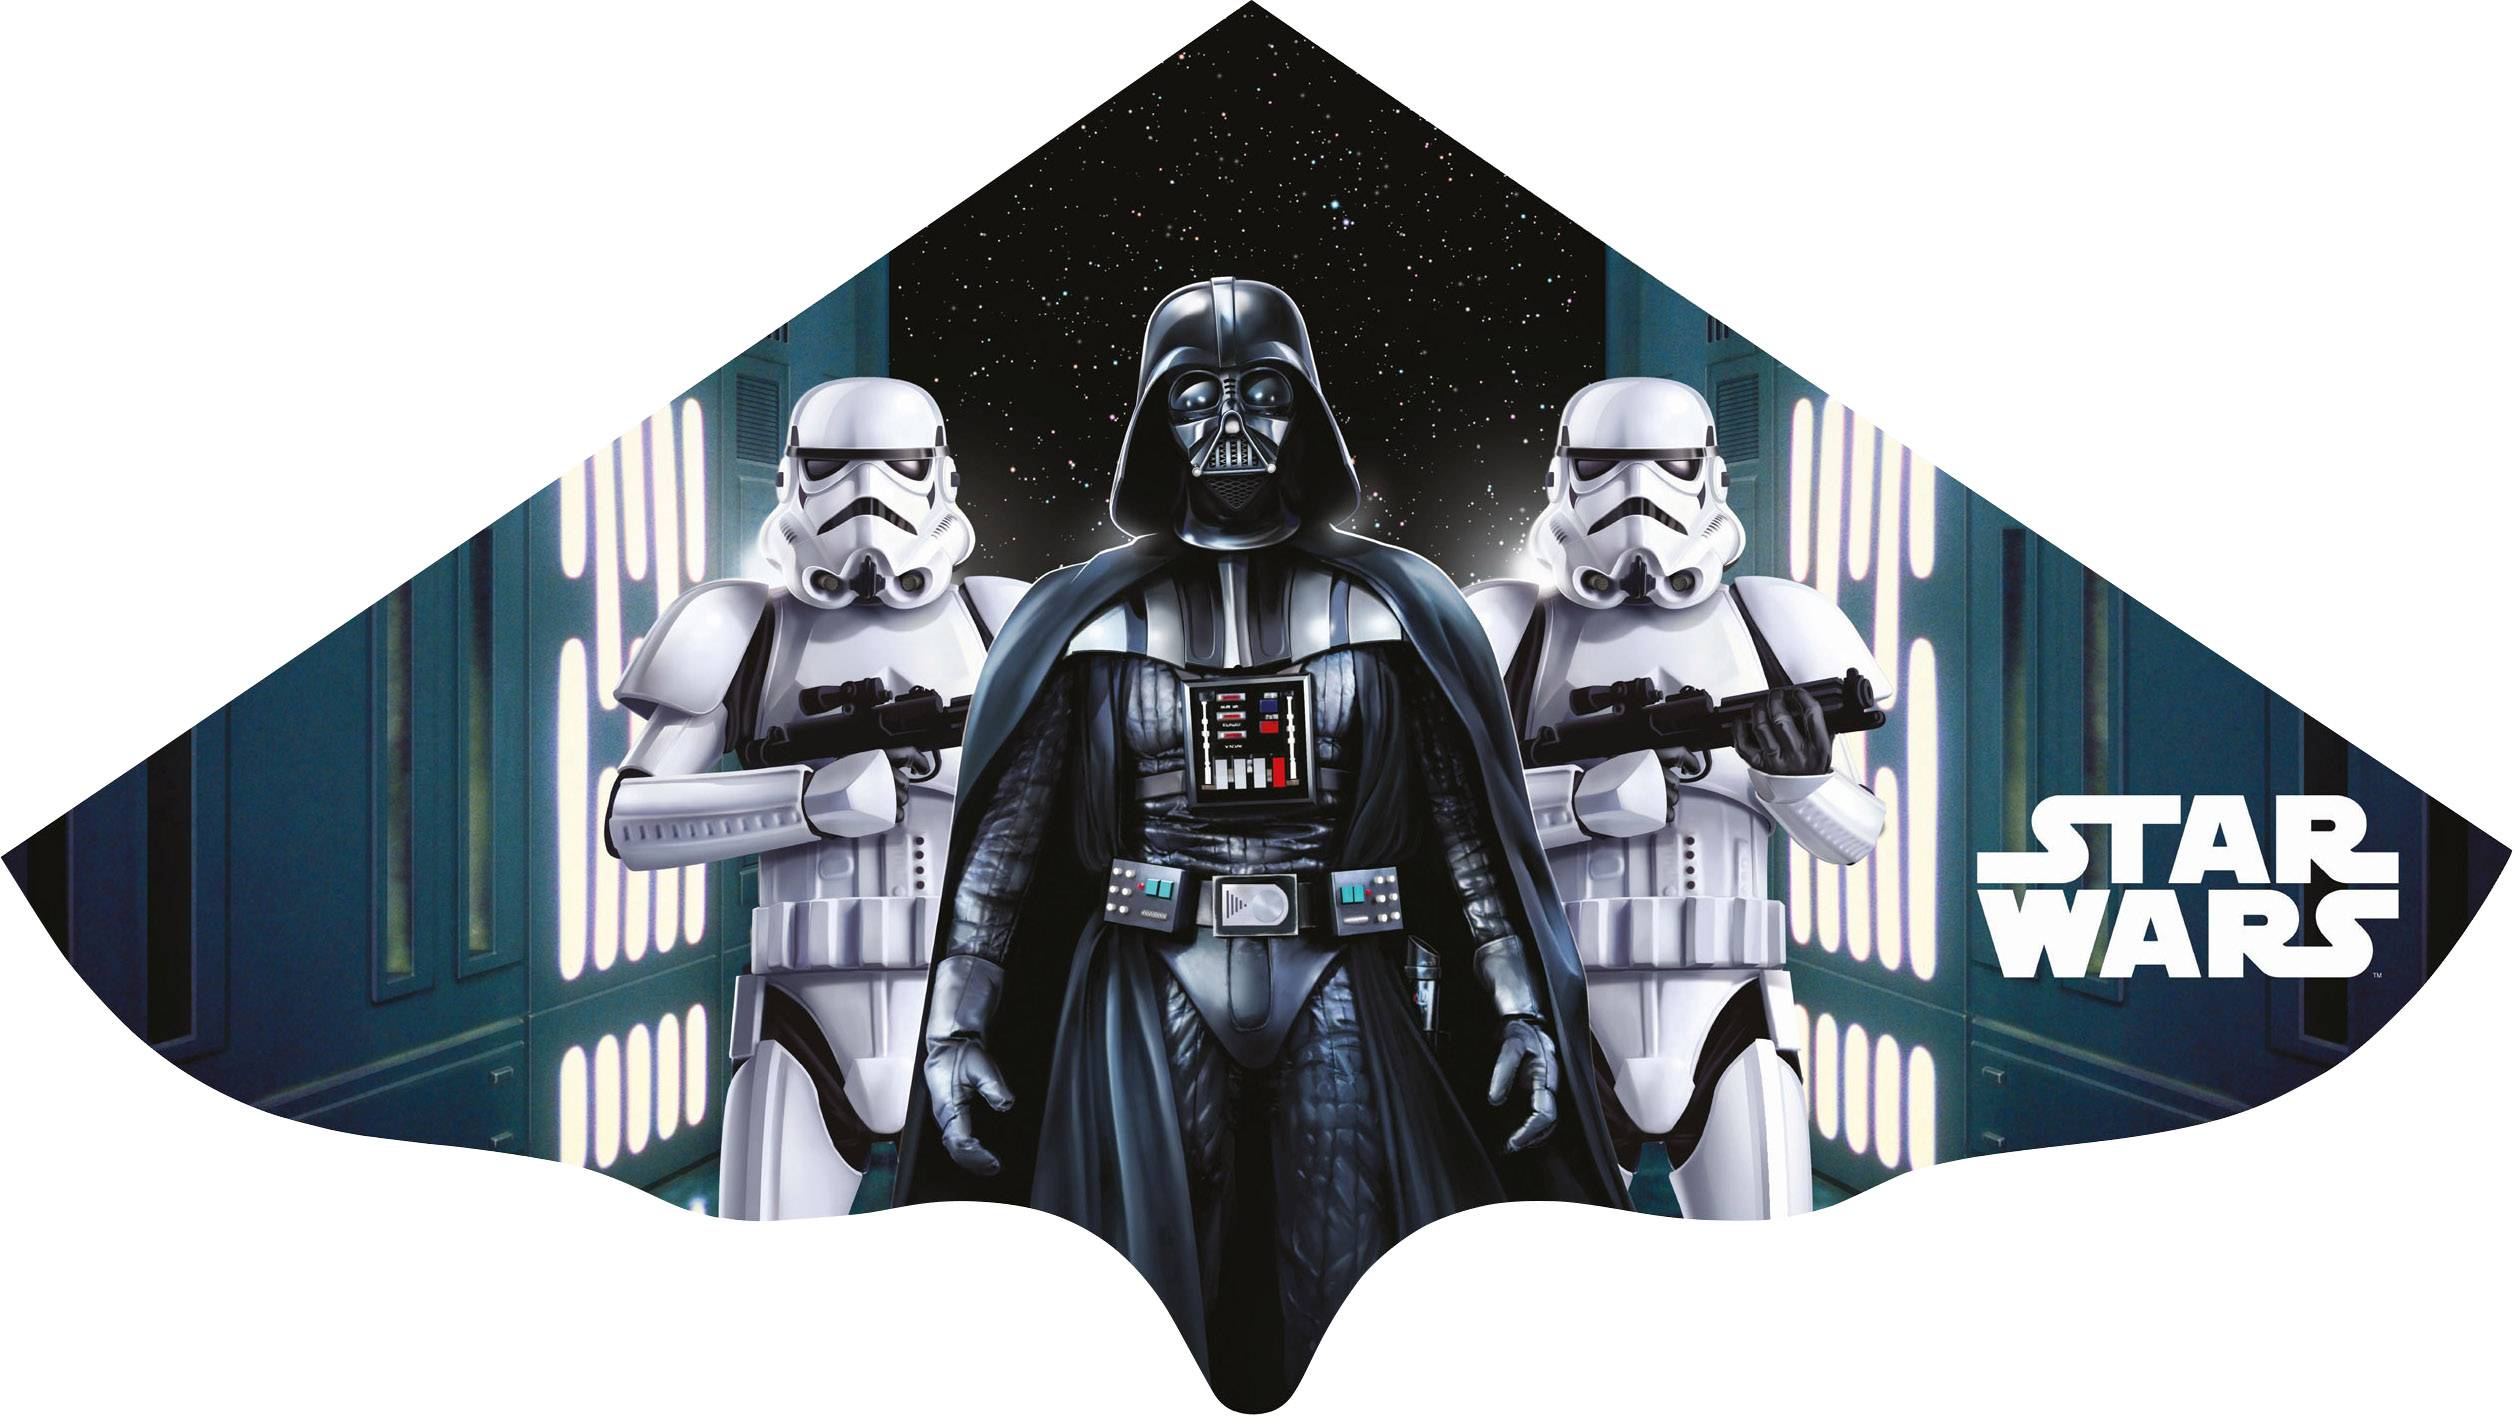 Šarkan pre deti Star Wars Yoda, Günther Flugspiele 1225, rozpätie 1150 mm